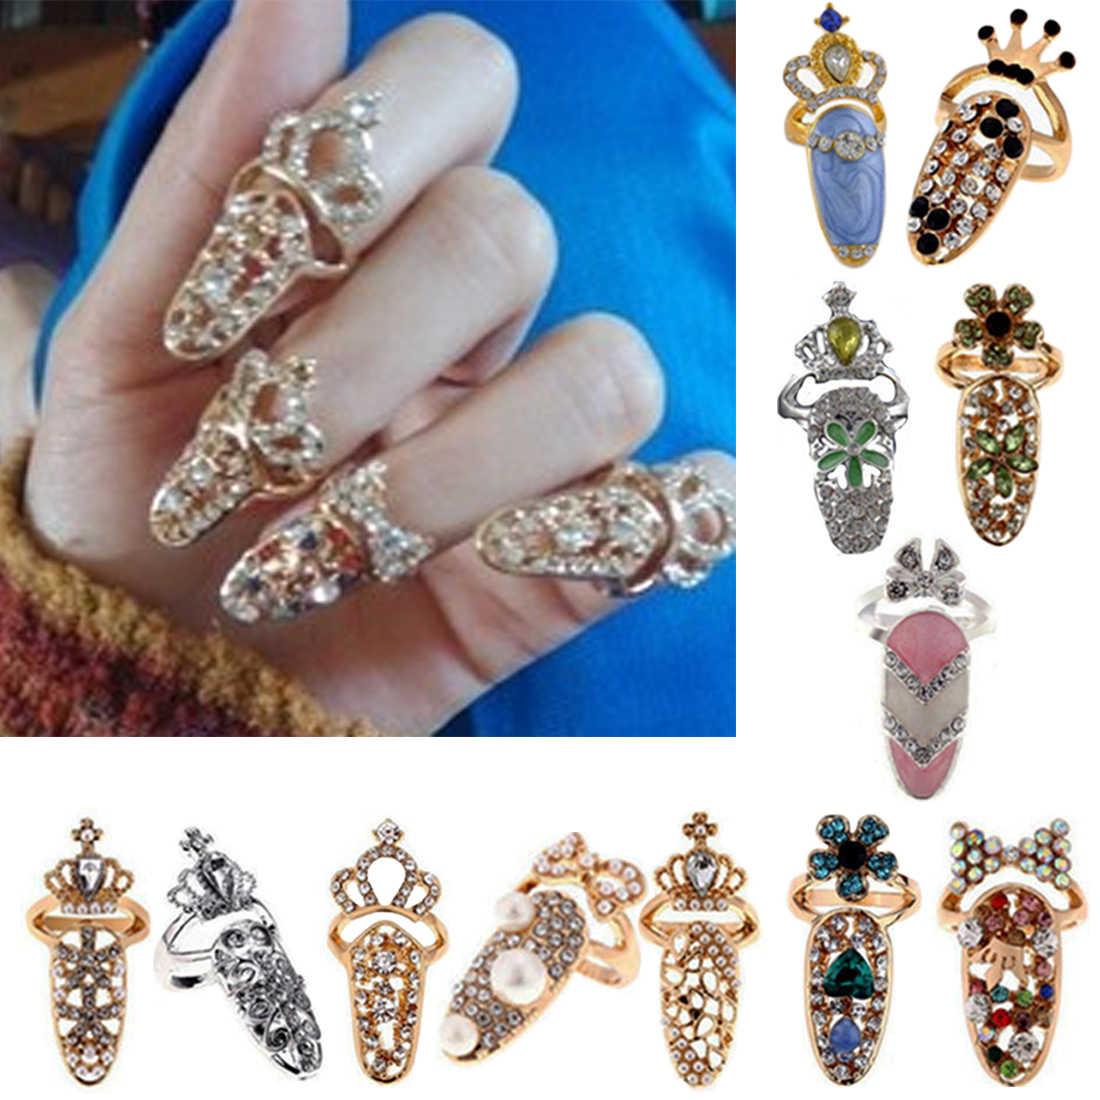 1 pieza de cristal falso clavo elegante exquisito anillo joyería exquisito diamante cubierta de uñas anillo de cola Junta anillo corona armadura Accesorios